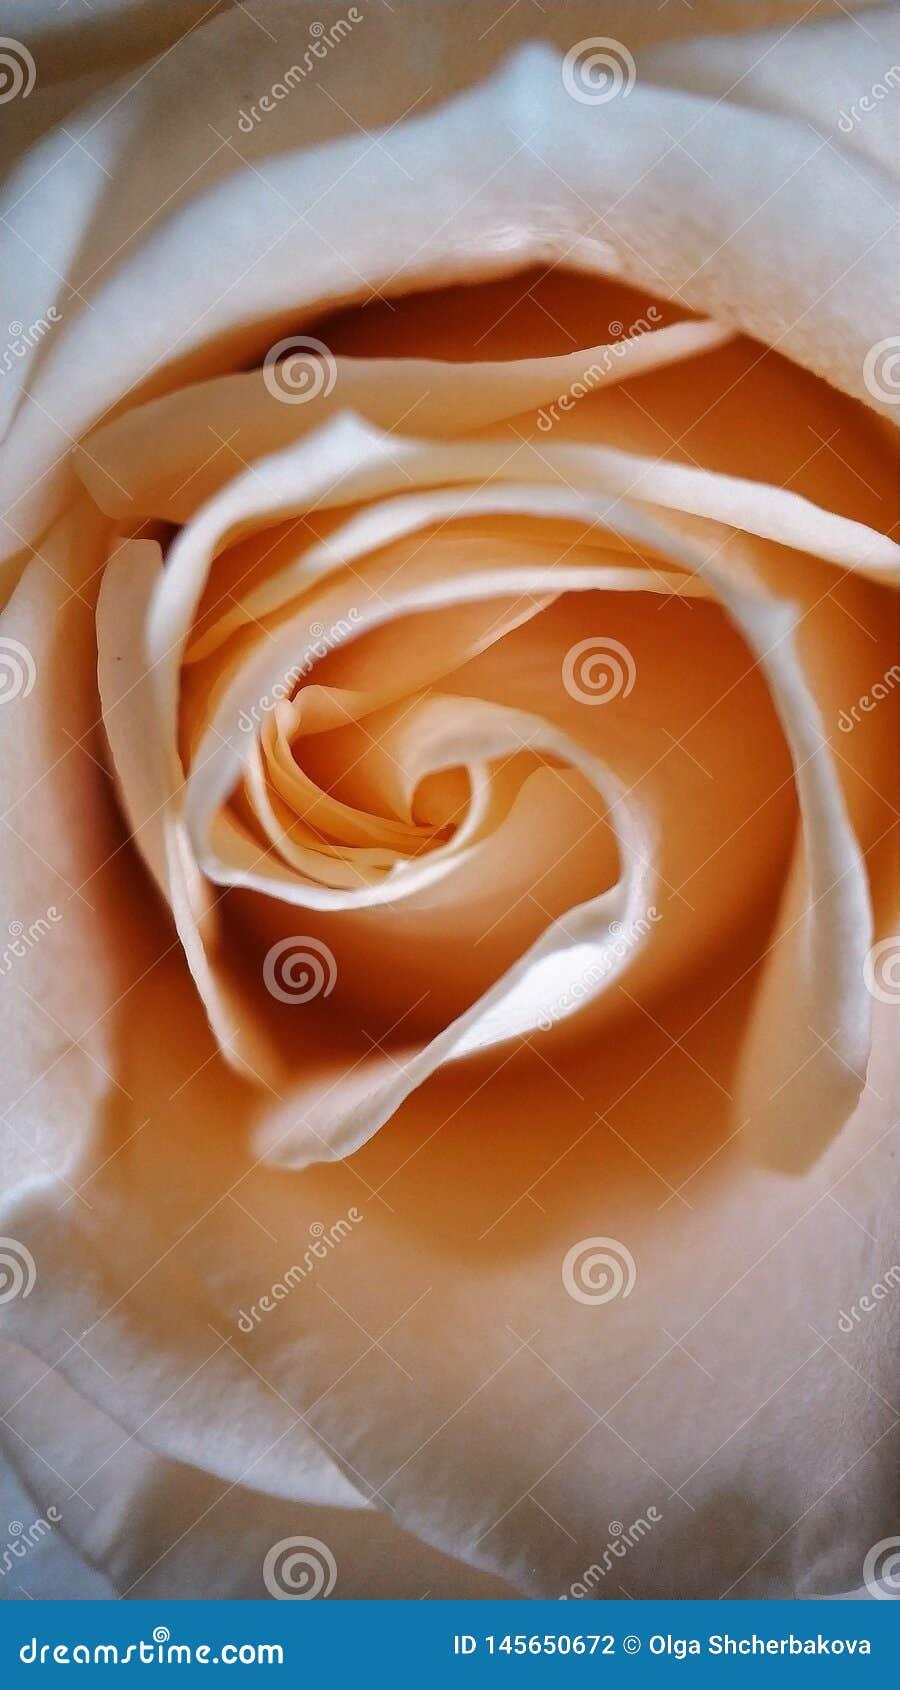 Detalle del dulce del rosa del p?talo color de rosa para la imagen de fondo